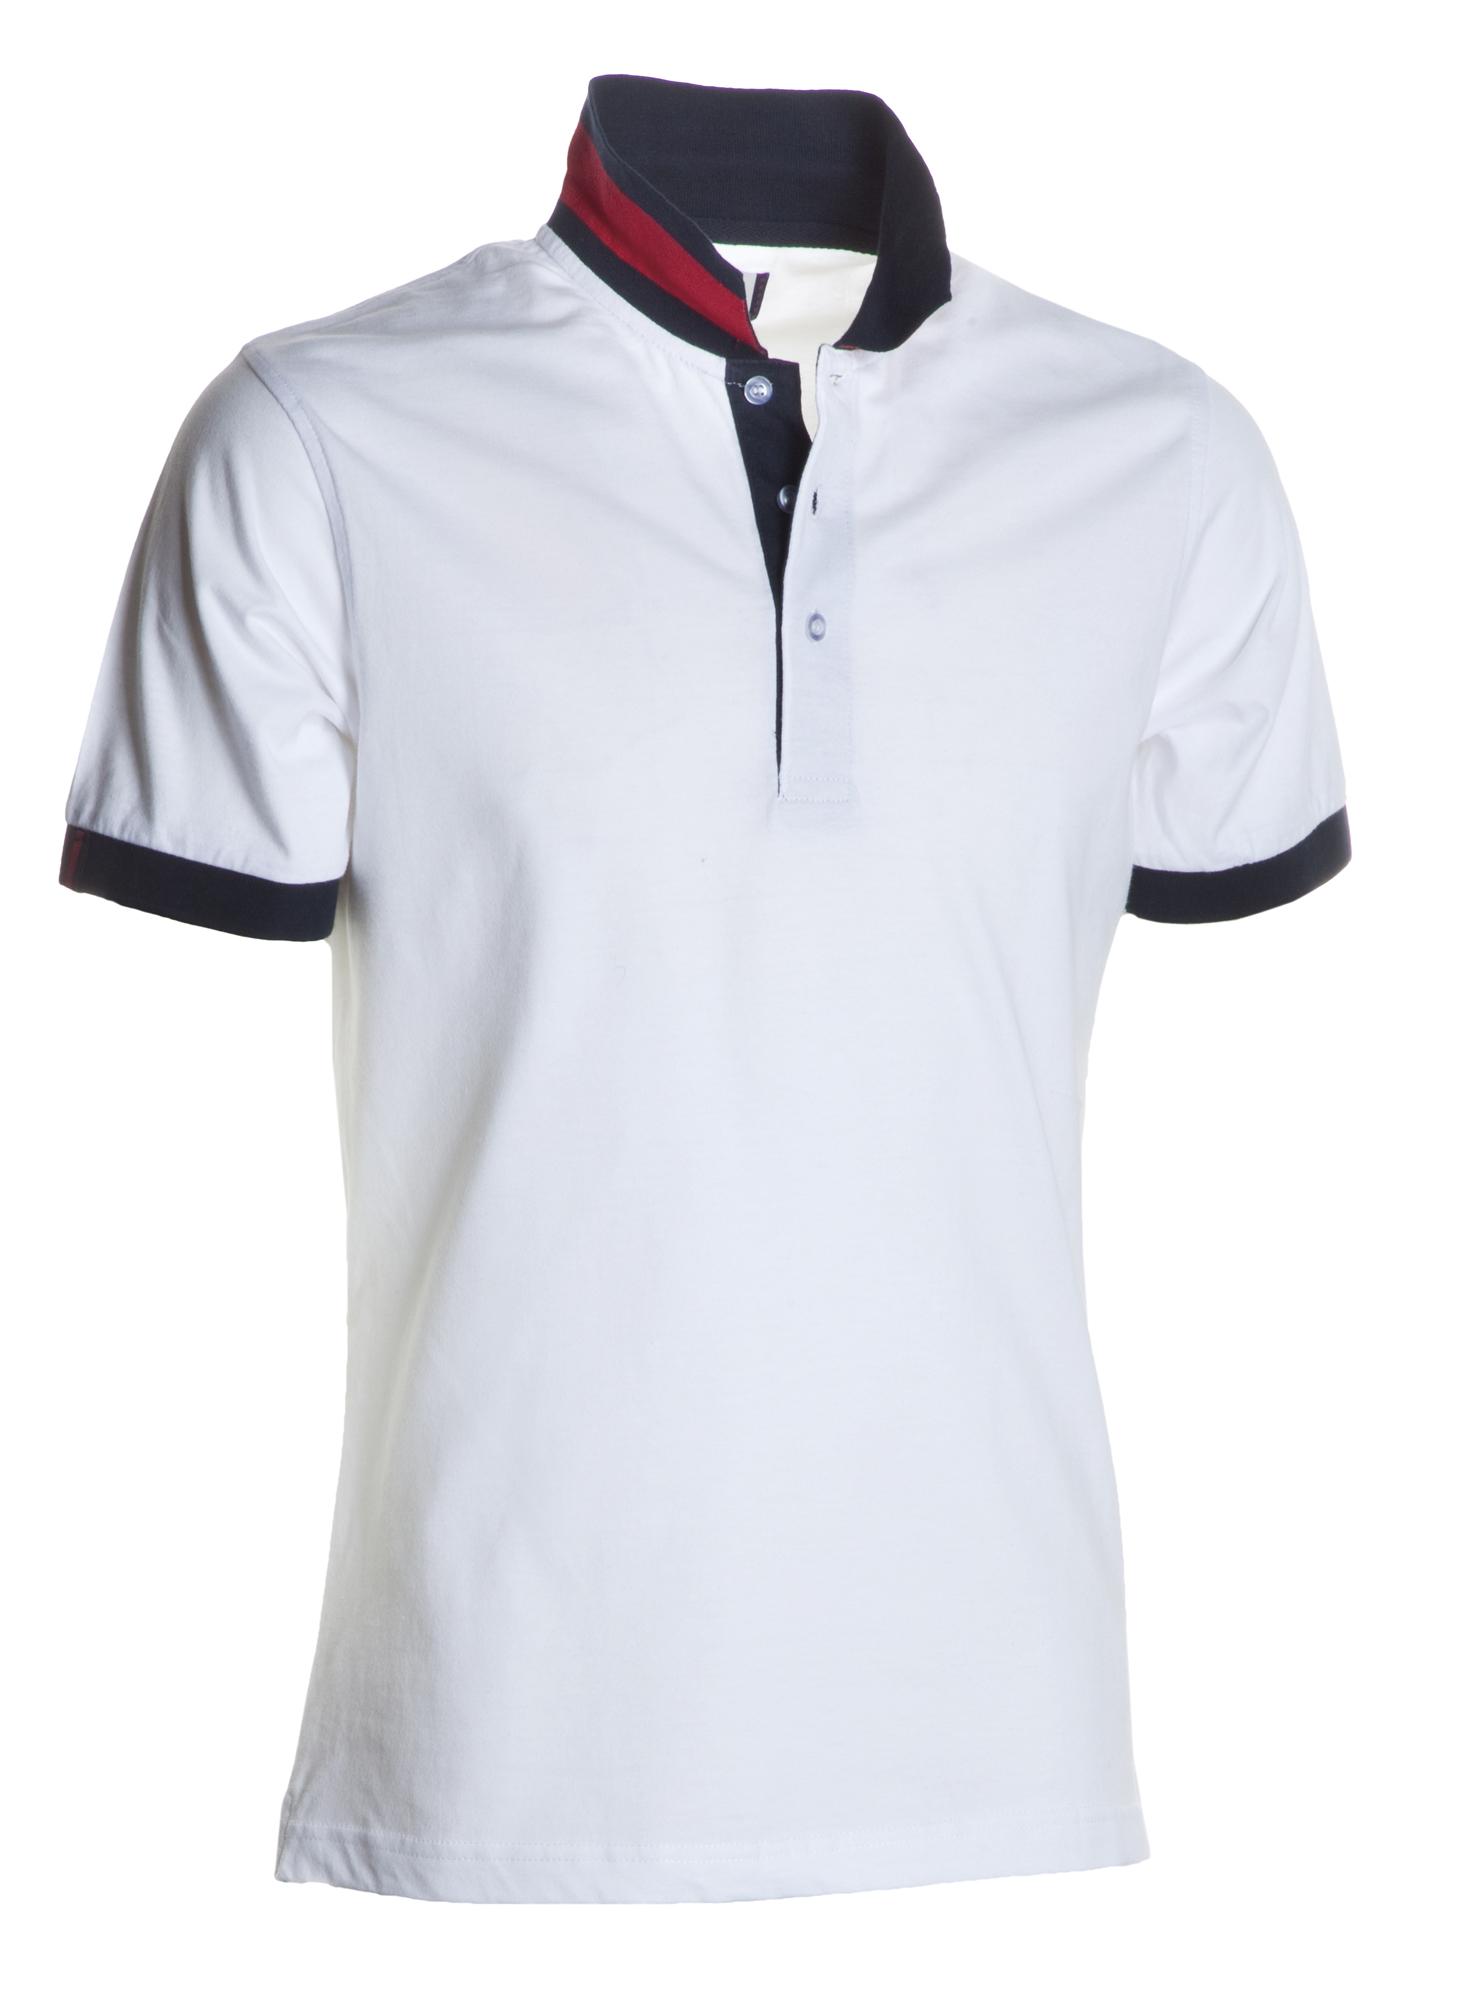 Polo homme manches courtes 100% coton, couleurs assorties, Bianco